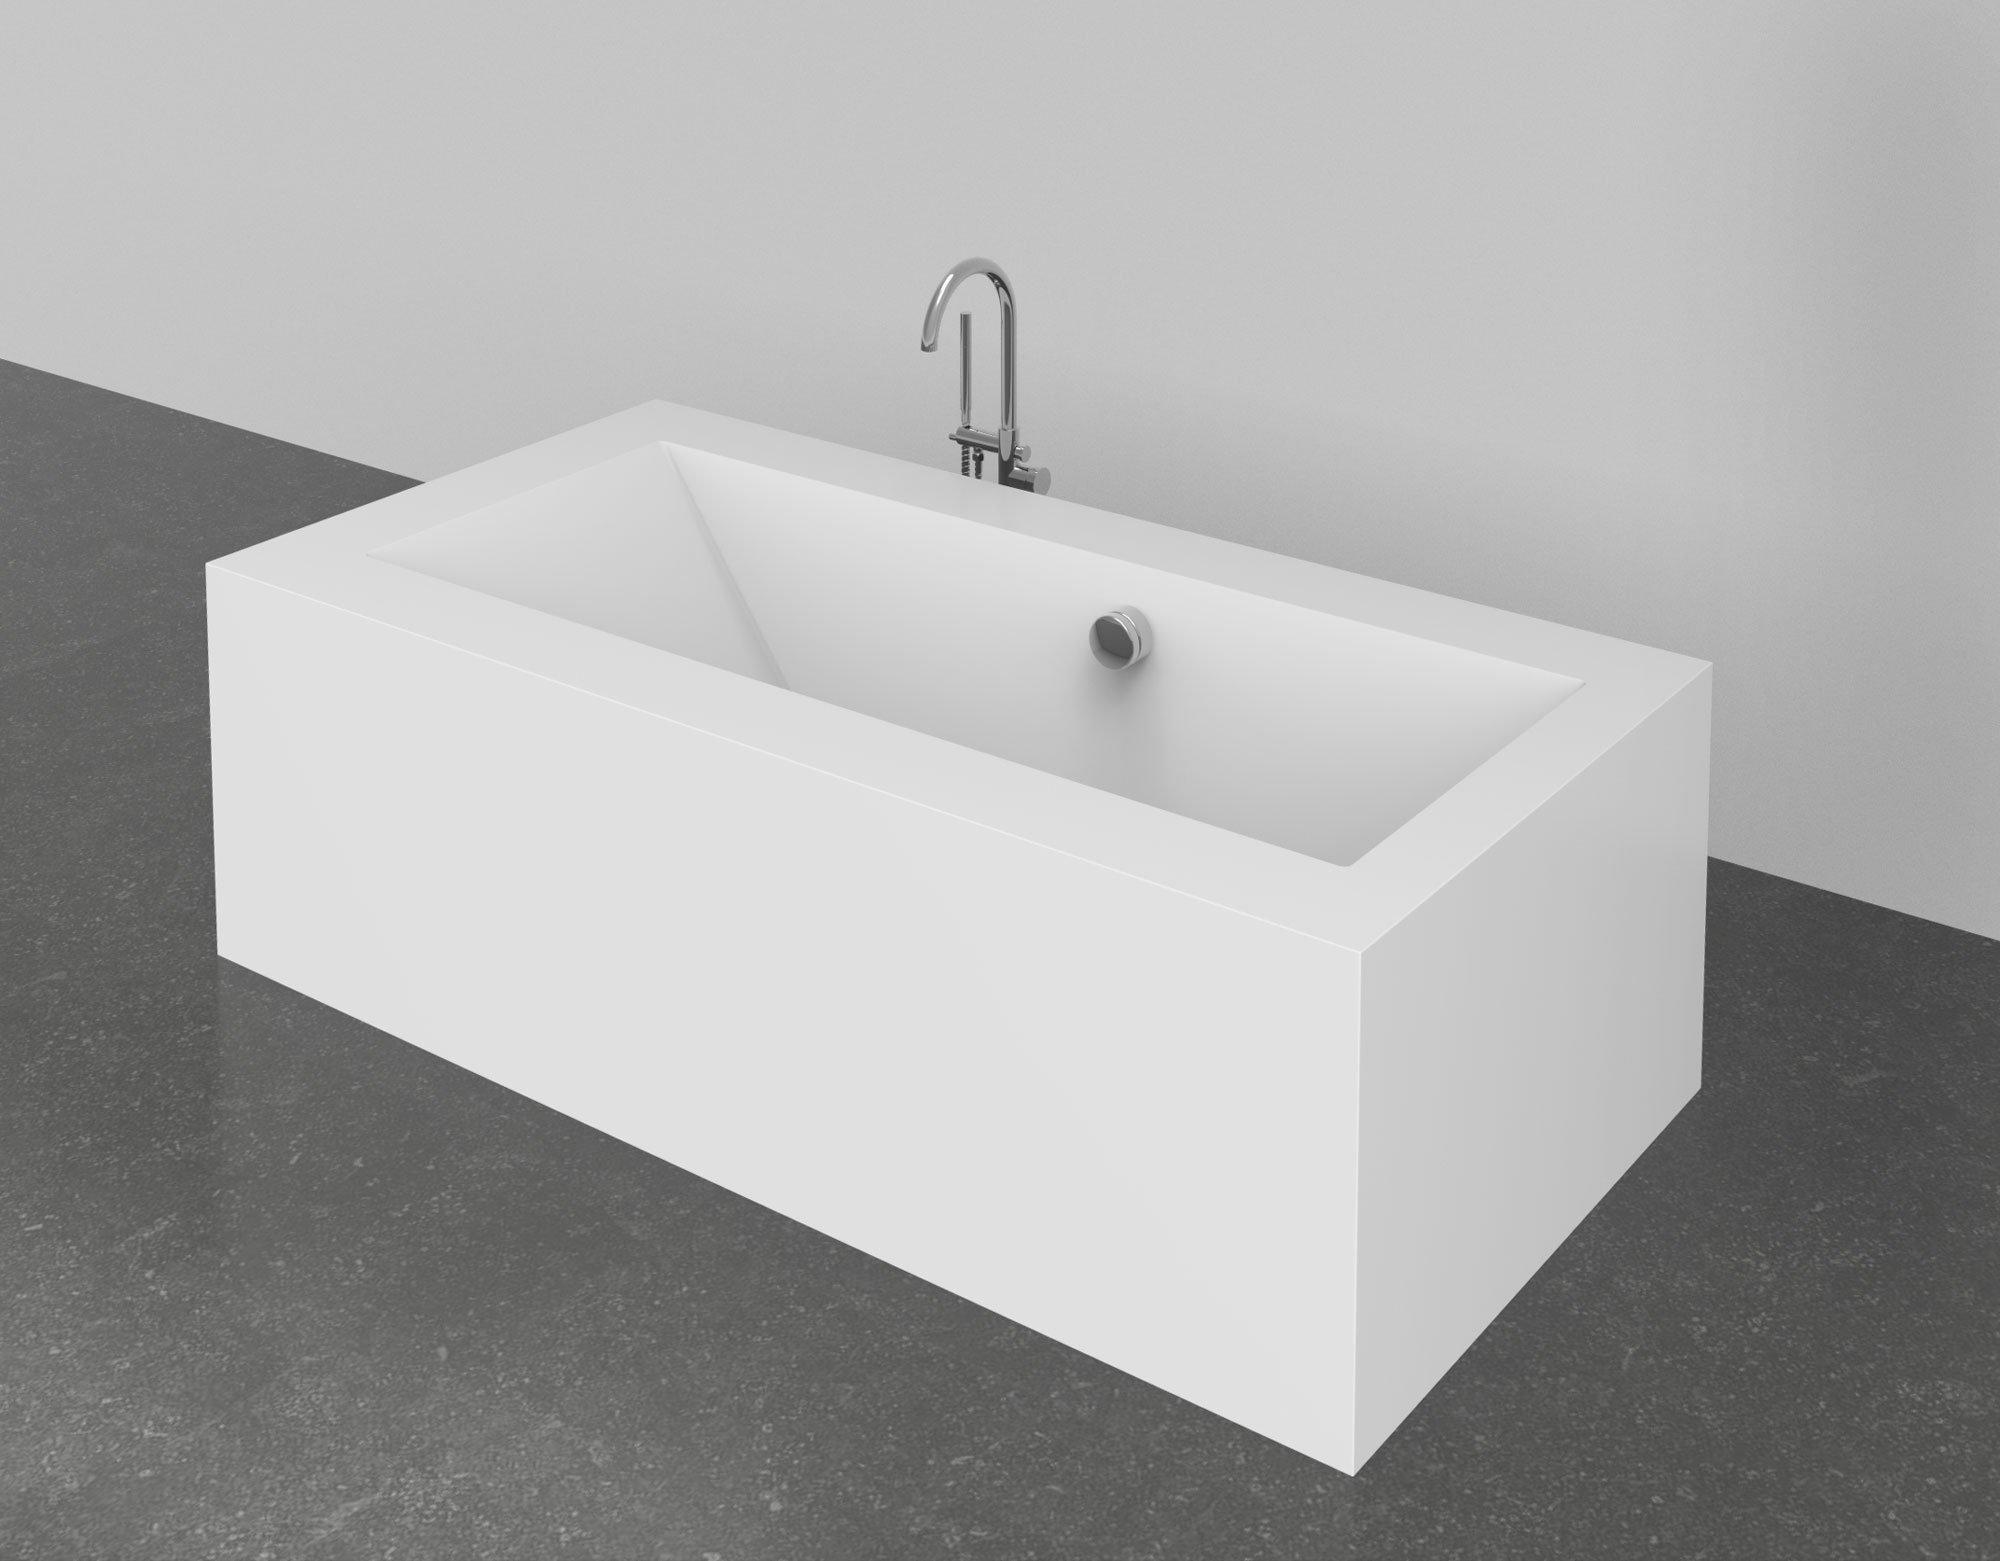 Vasche da bagno in Corian | Duraltop